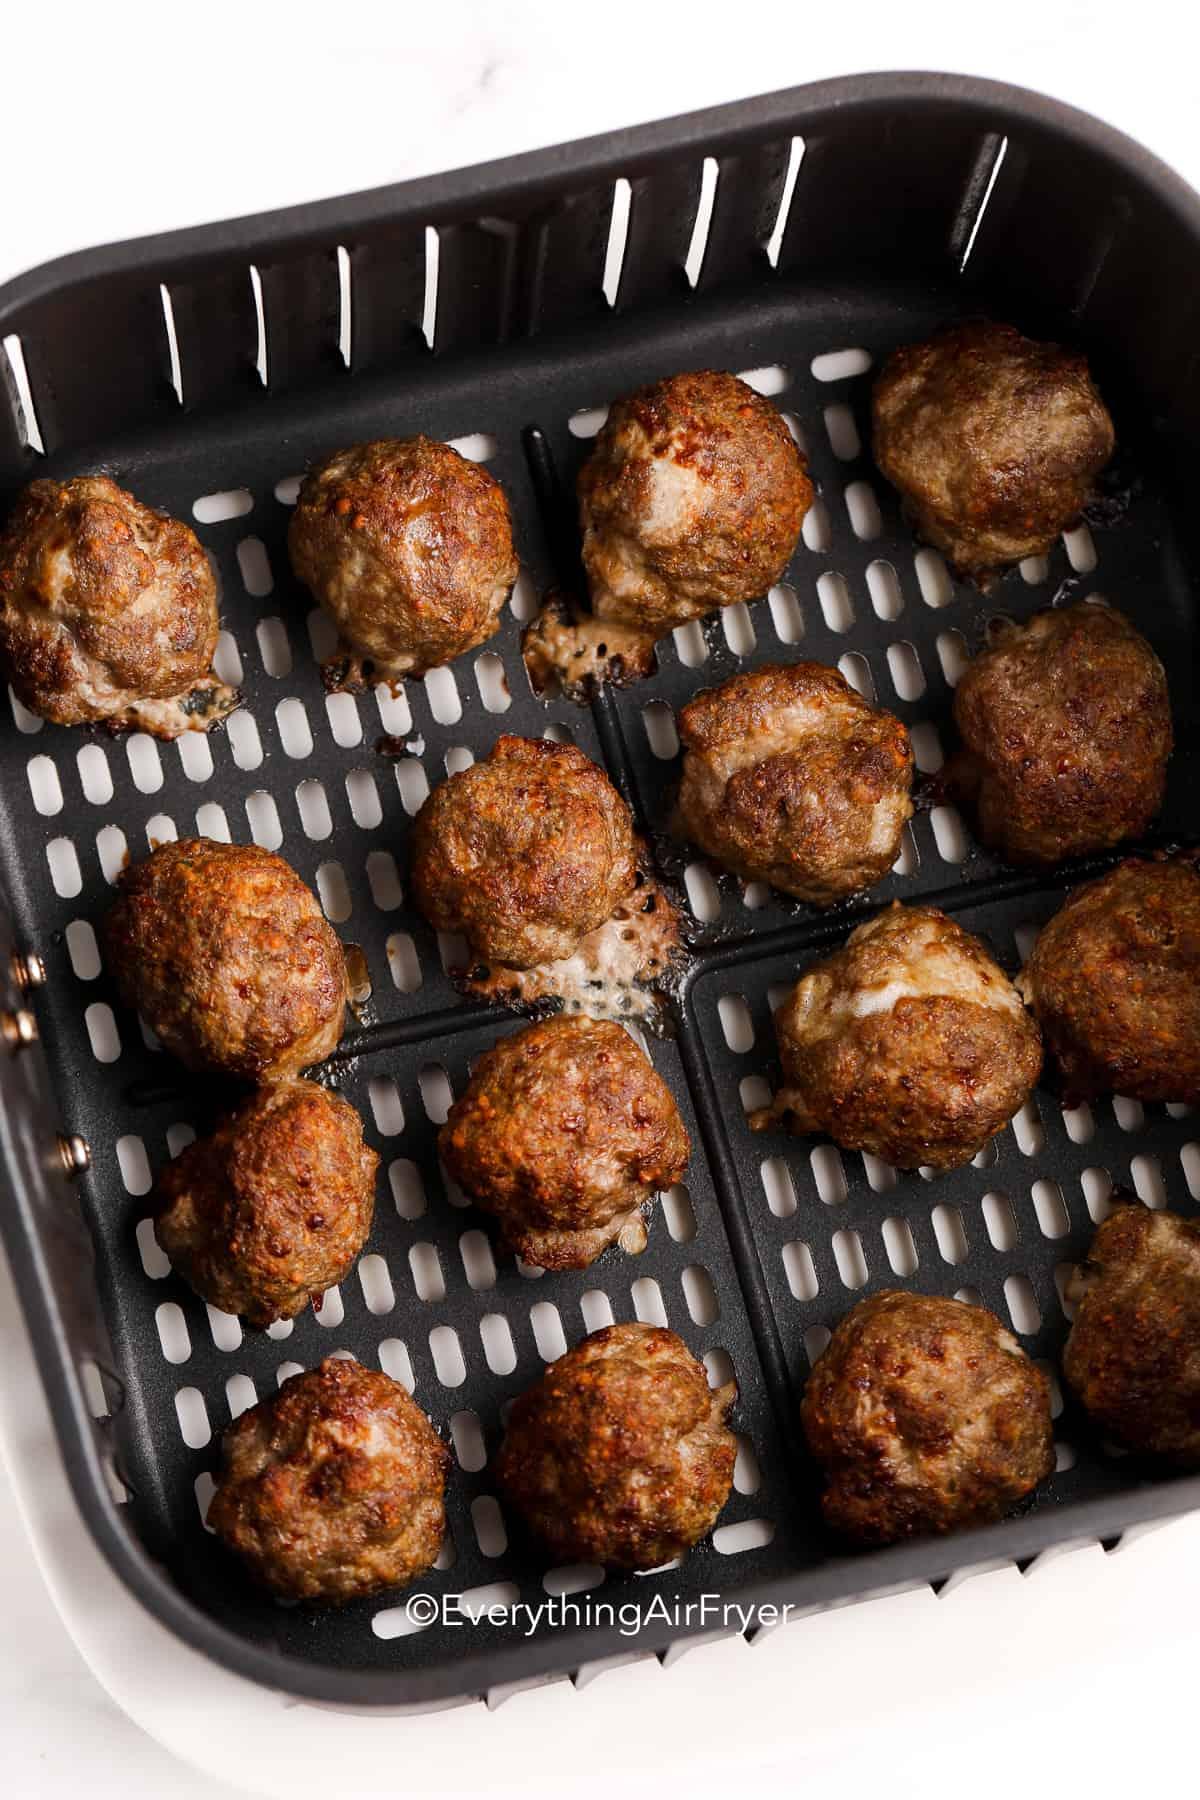 meatballs in an air fryer basket